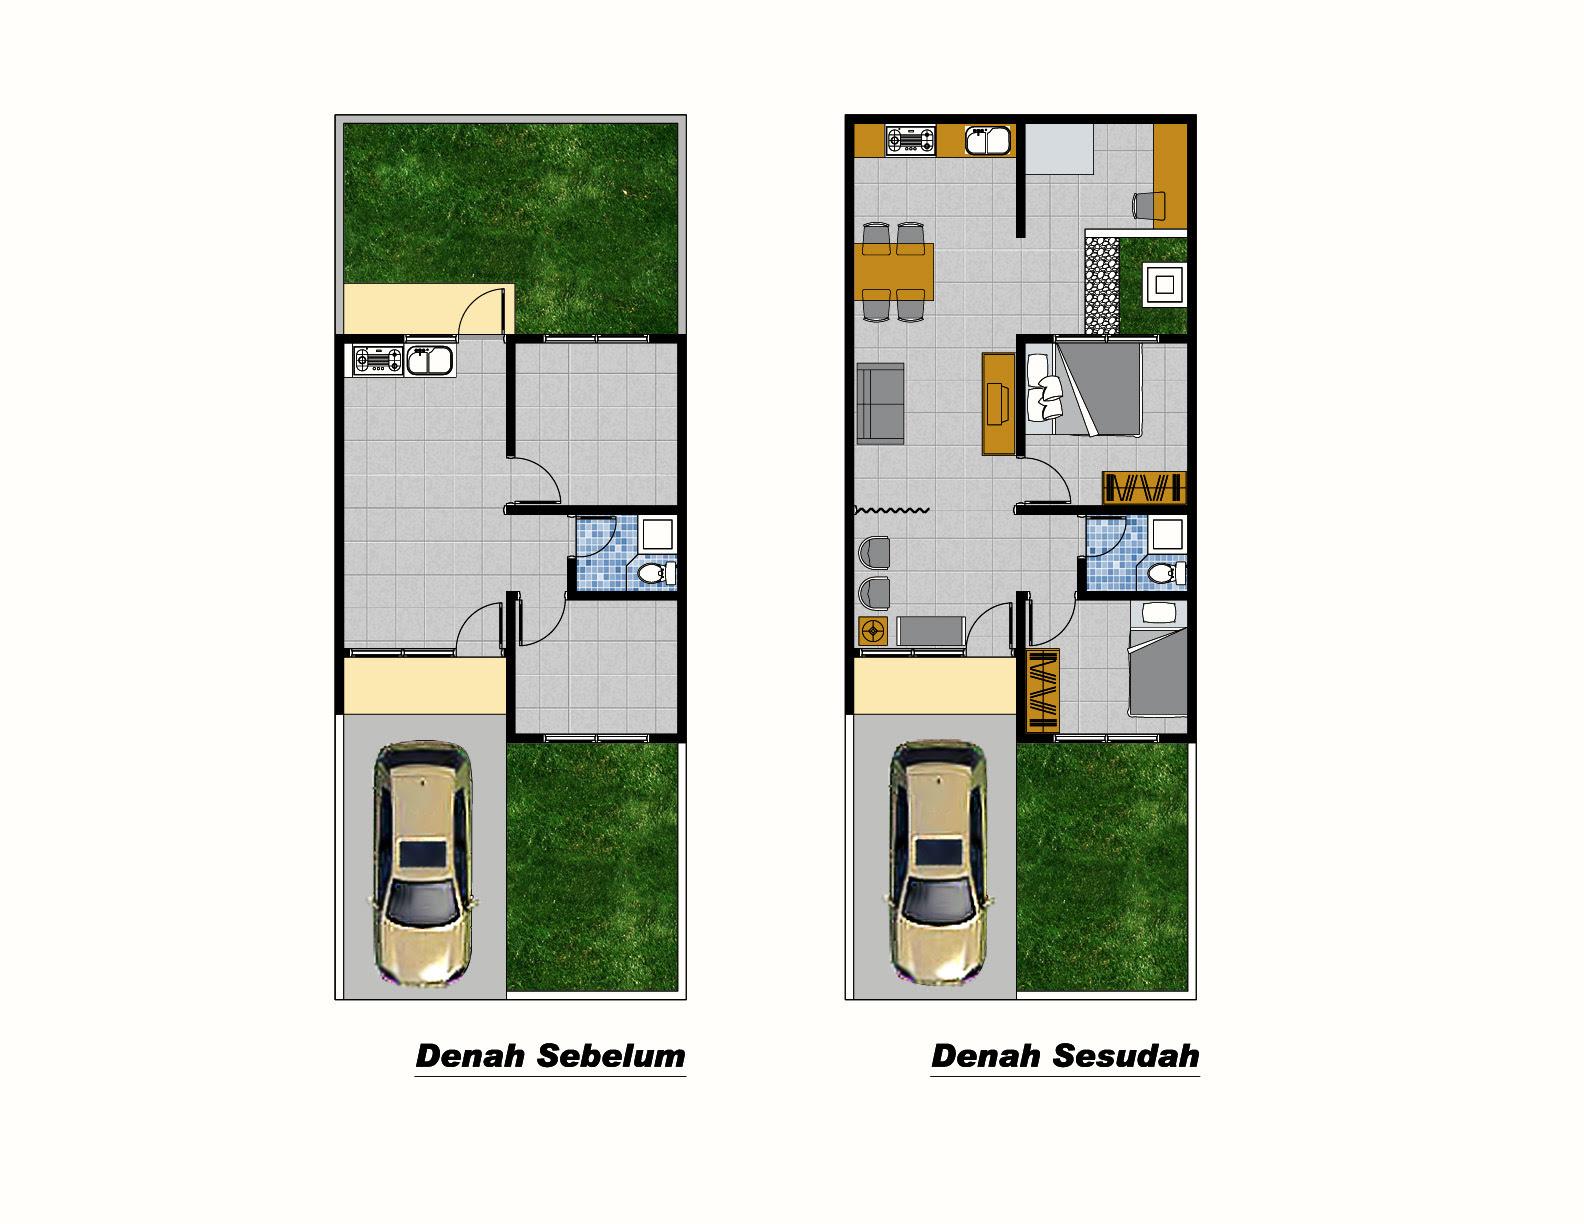 104 Gambar Rumah Minimalis Sederhana Ukuran 7x9 Gambar